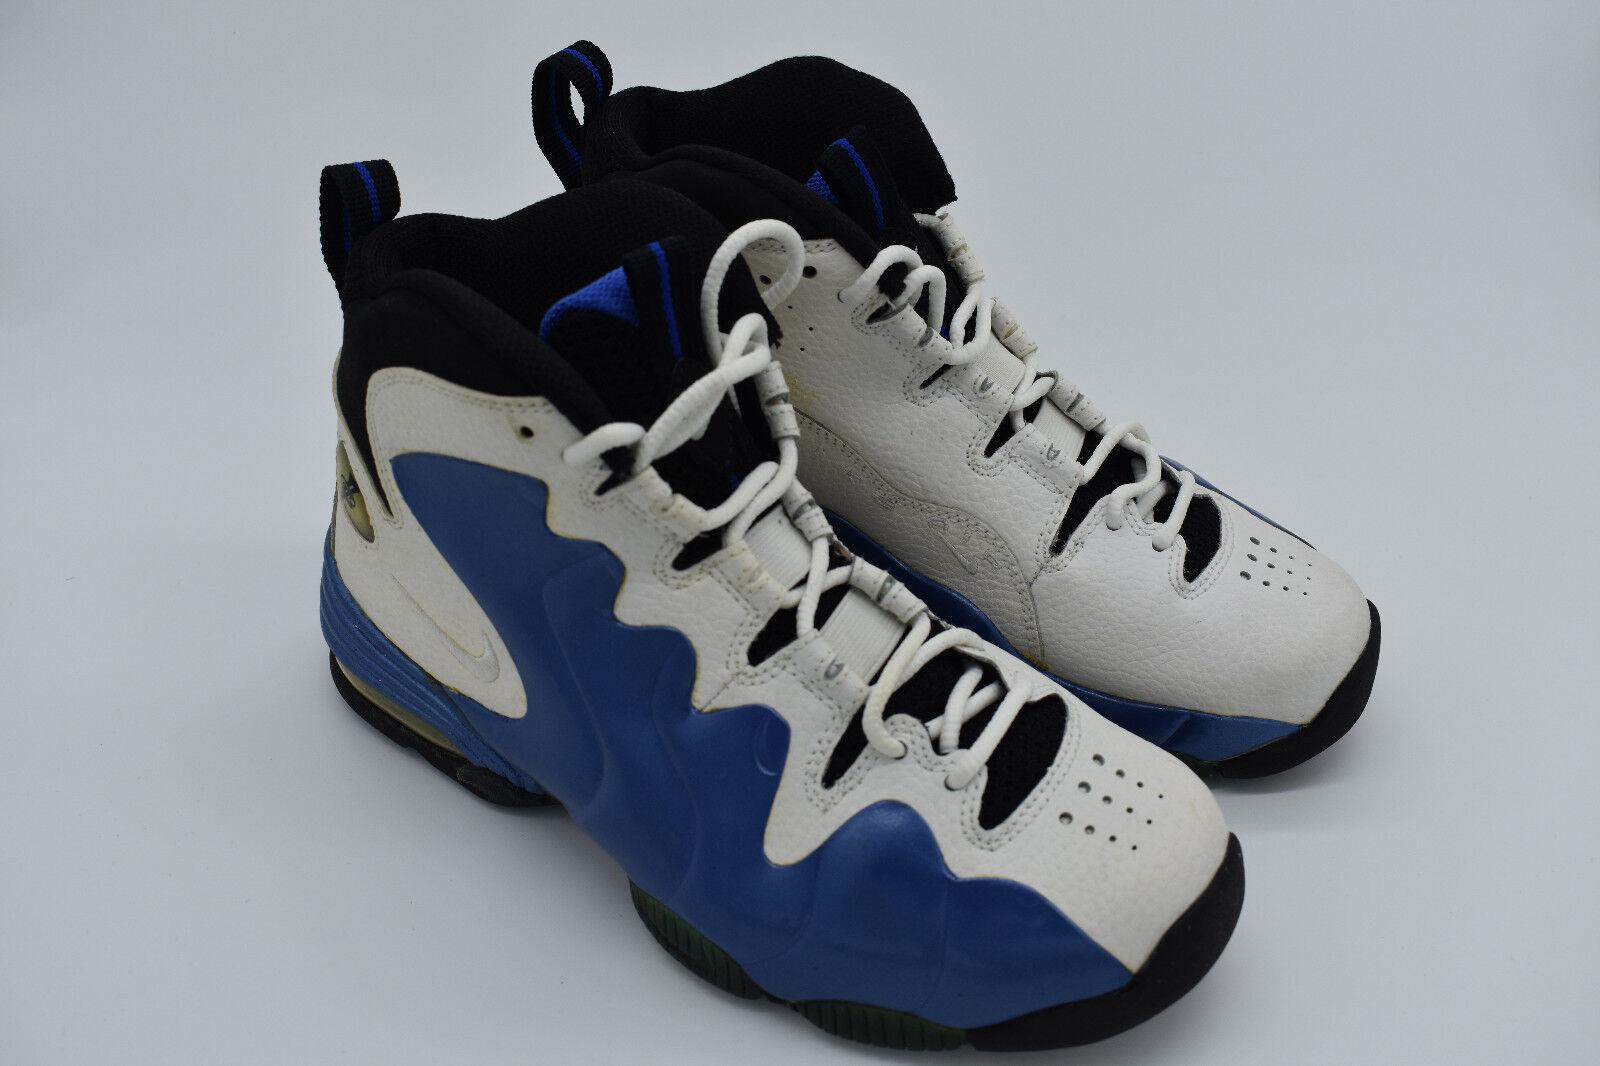 Nike Air Penny 3 Retro - Size 5.5US